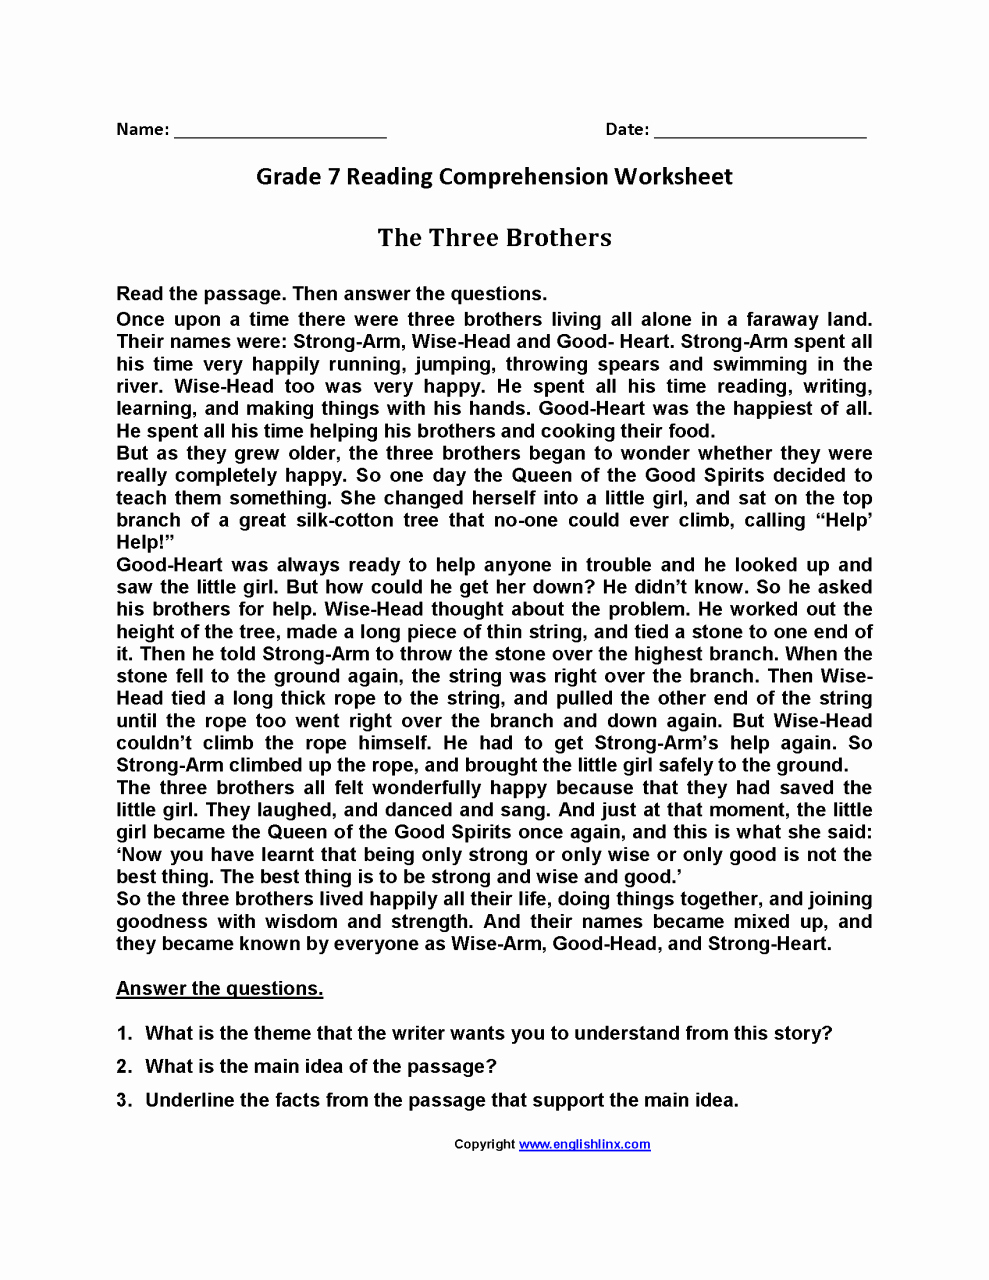 Free 7th Grade Reading Worksheets Awesome 7th Grade English Worksheets Year 7 Kidsworksheetfun